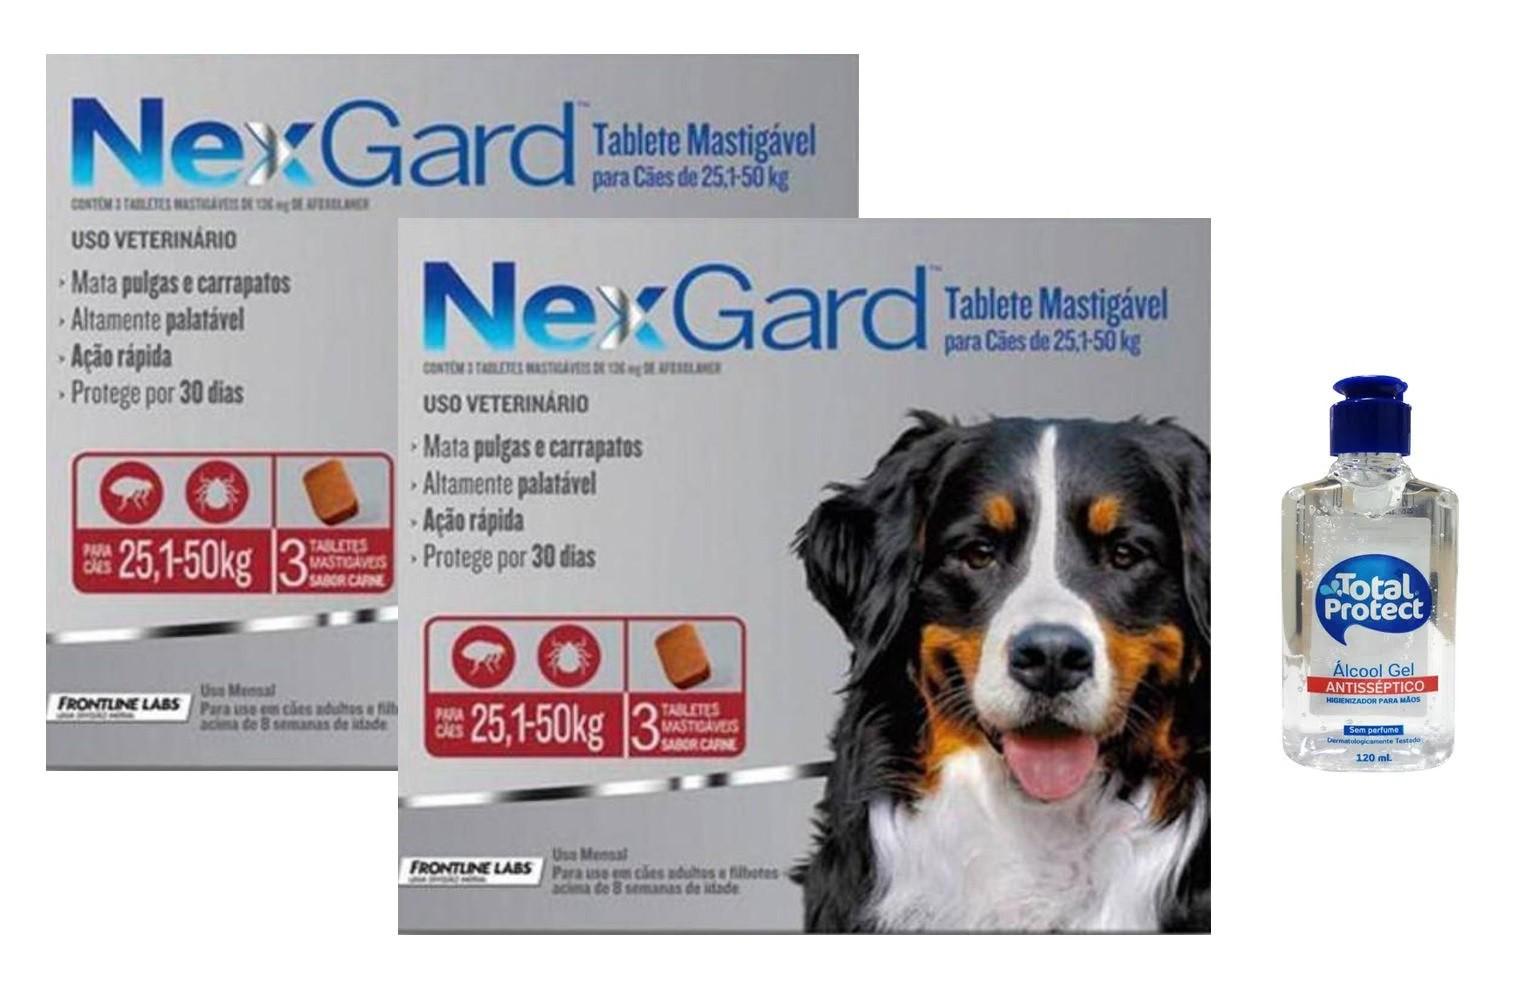 Kit 2 Unidades Antipulgas e Carrapatos Nexgard 136mg para Cães de 25,1 a 50kg (3 tabletes) - Boehringer Ingelheim + Brinde Álcool Gel 120ml Total Protect